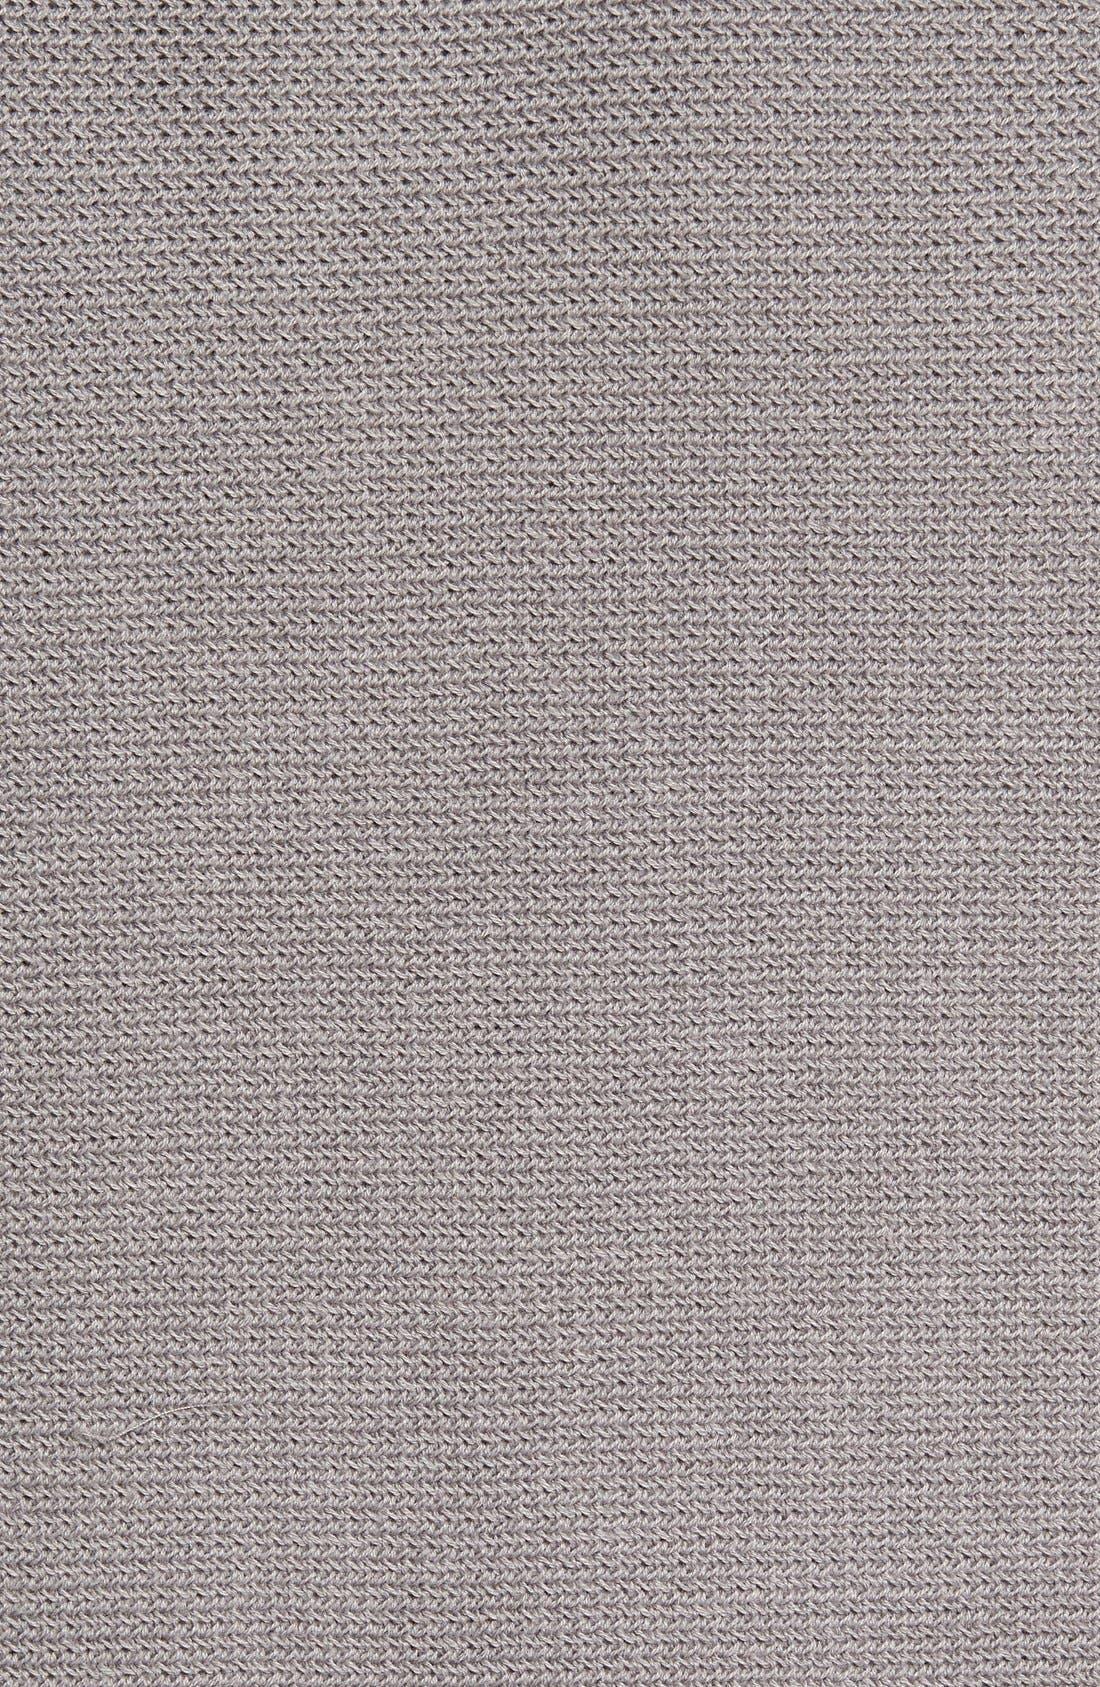 'Benson' Quarter Zip Textured Knit Sweater,                             Alternate thumbnail 8, color,